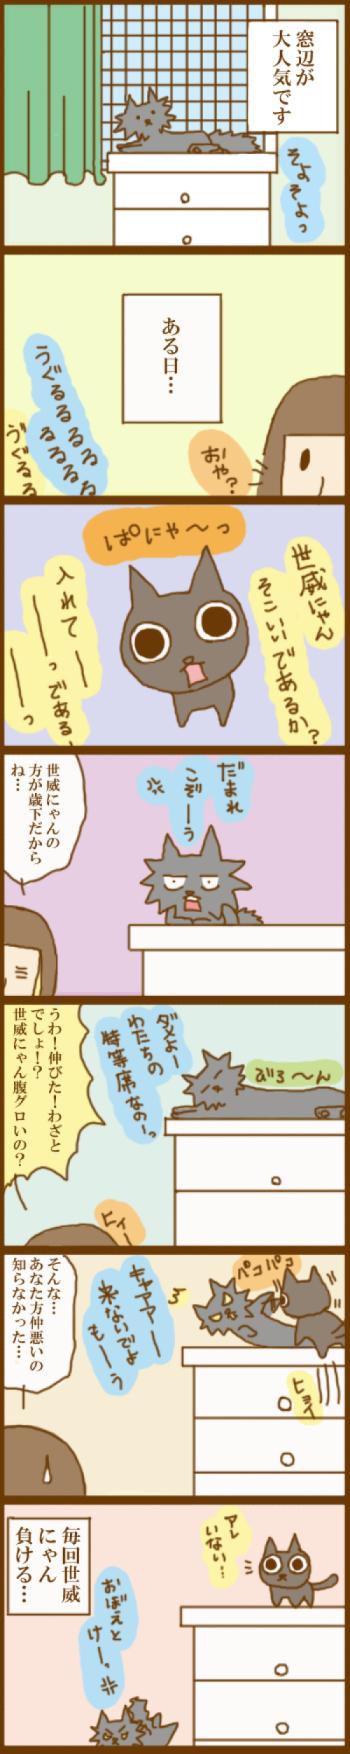 f:id:suzuokayu:20201119140809j:plain